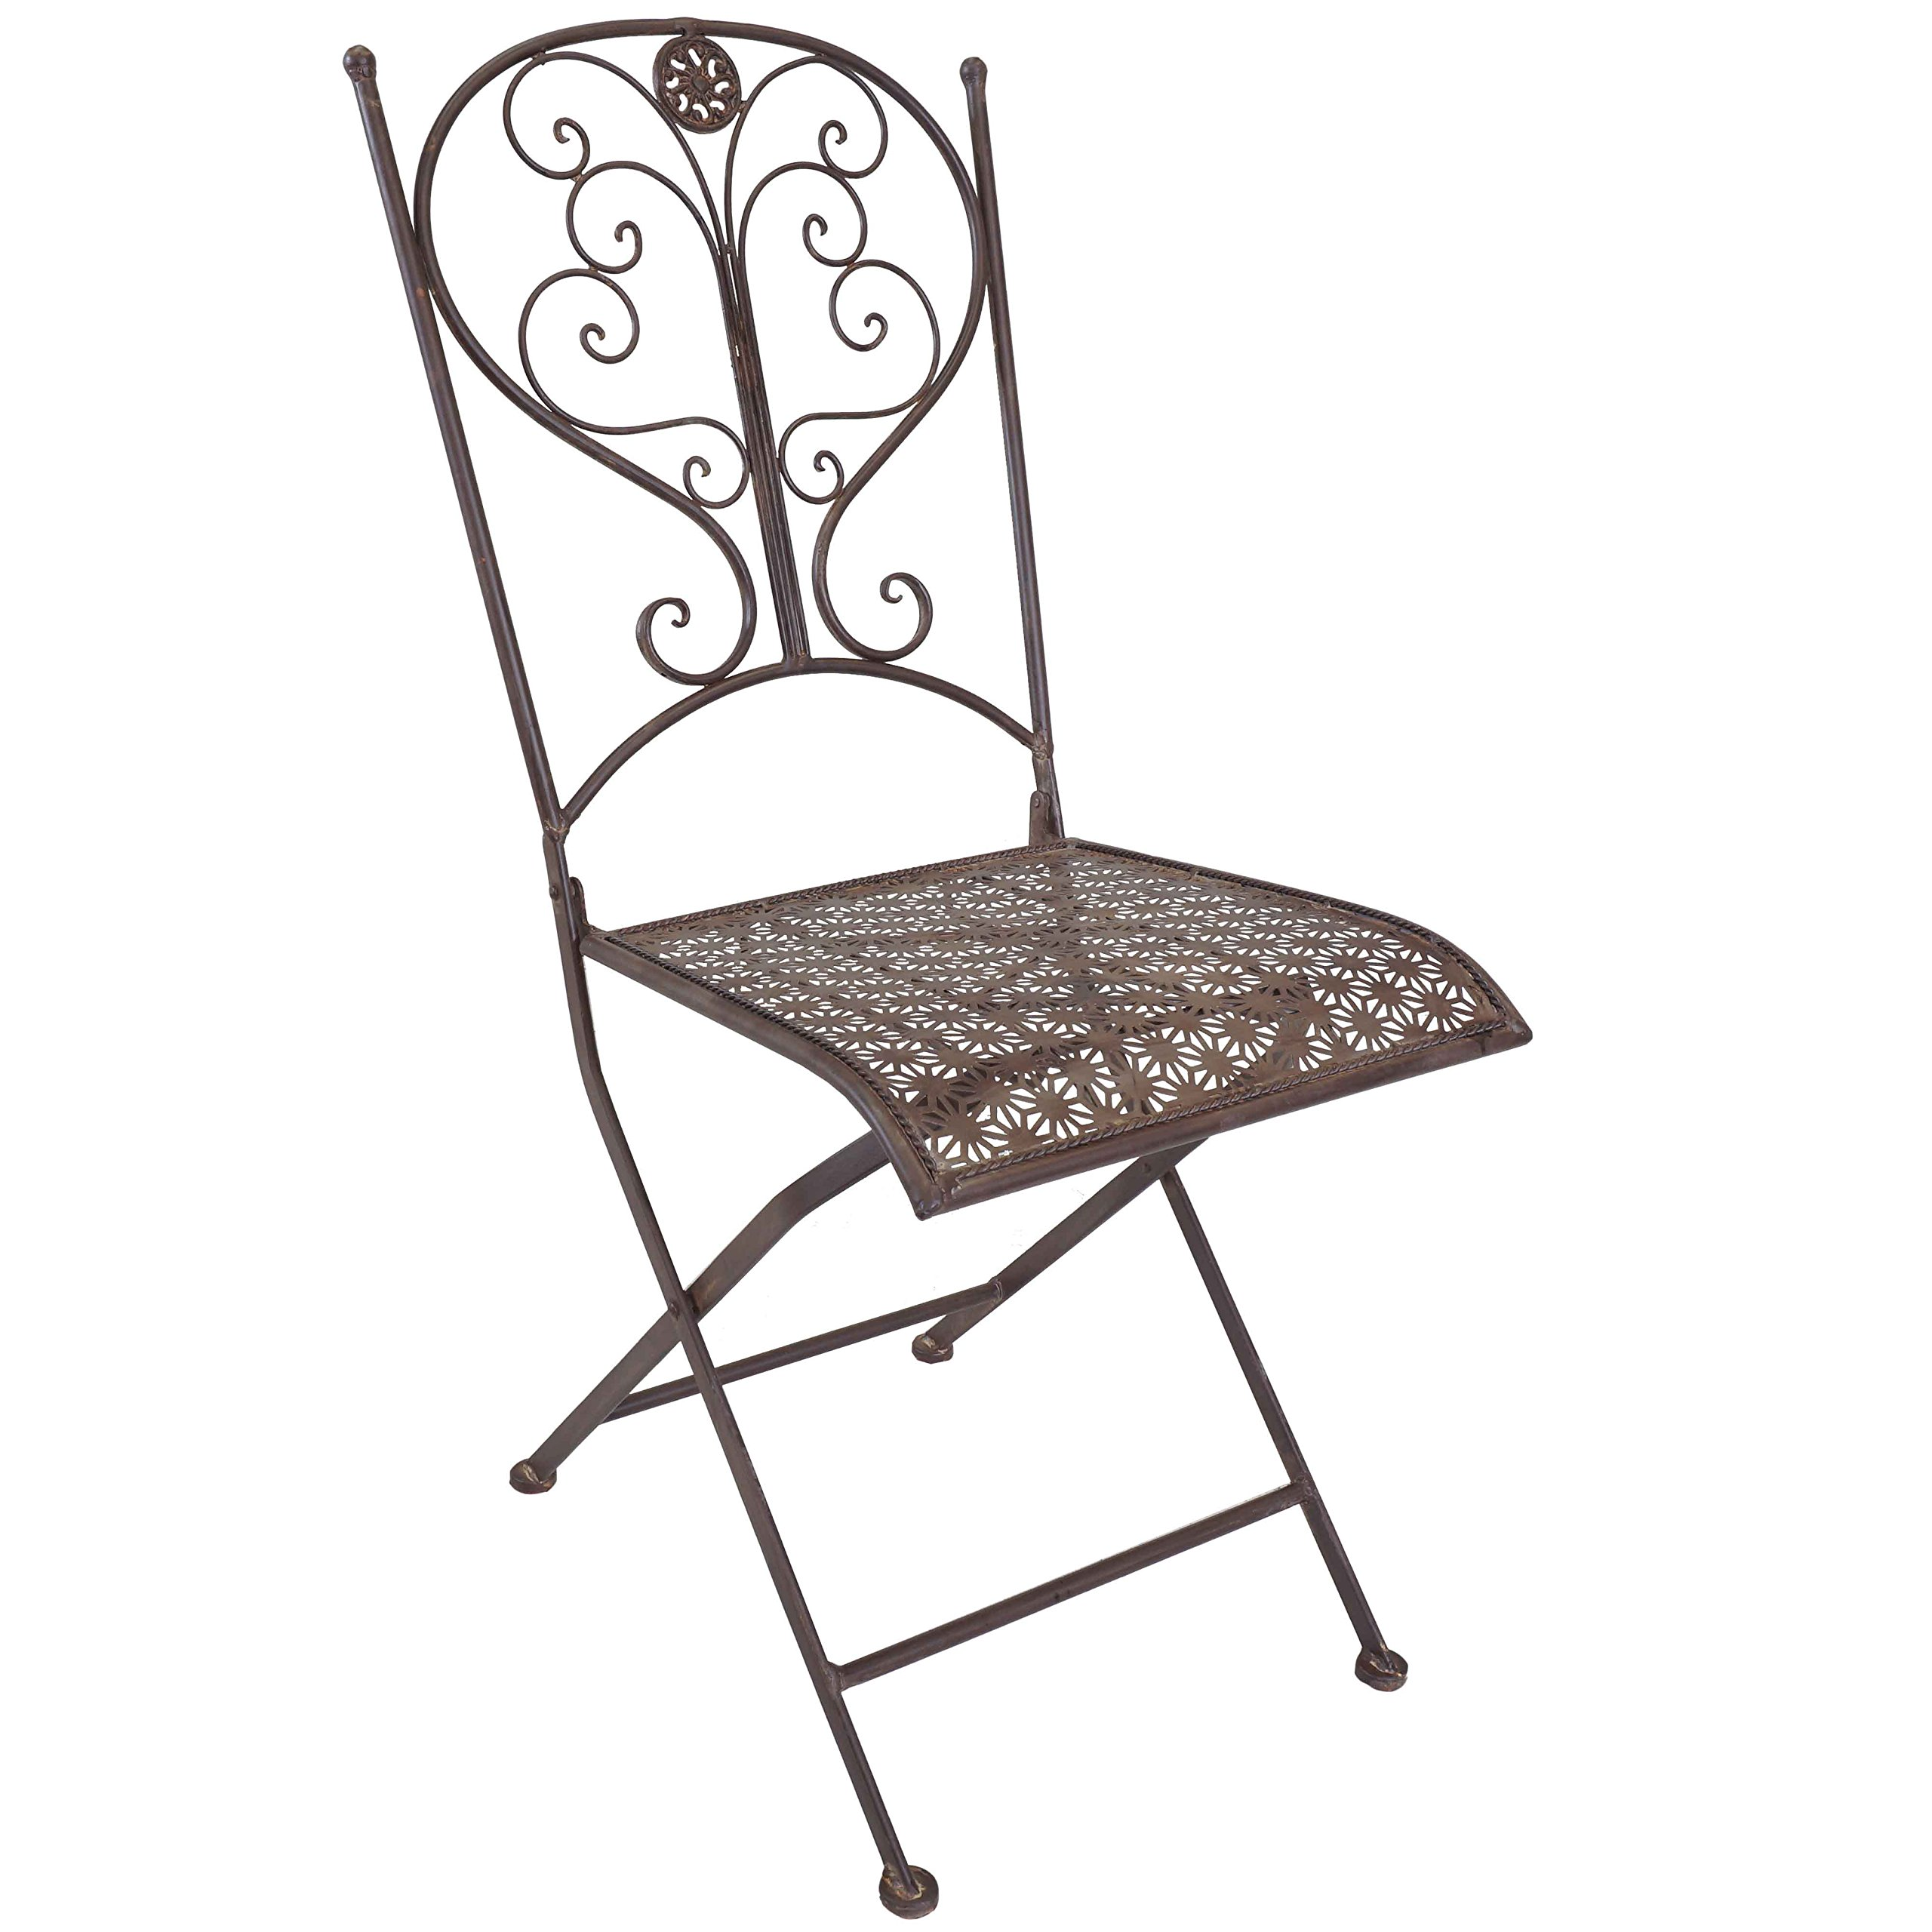 Titan Outdoor Antique Steel Folding Chair Porch Patio Garden Deck Decor Rust Rustic